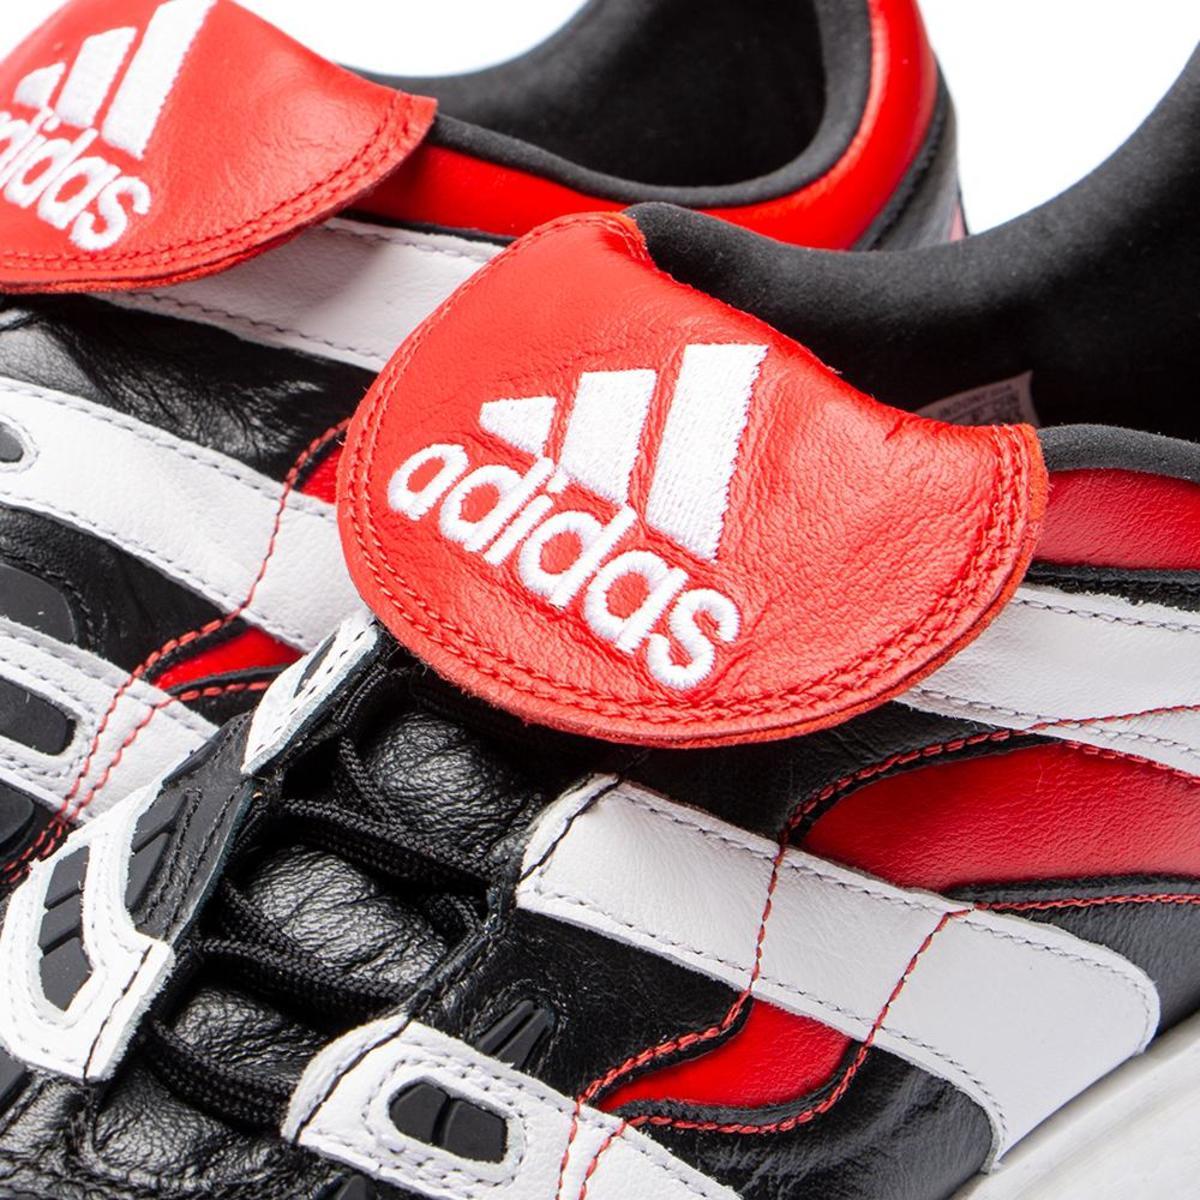 4b3ddb156fea Adidas Predator Accelerator - Core Black